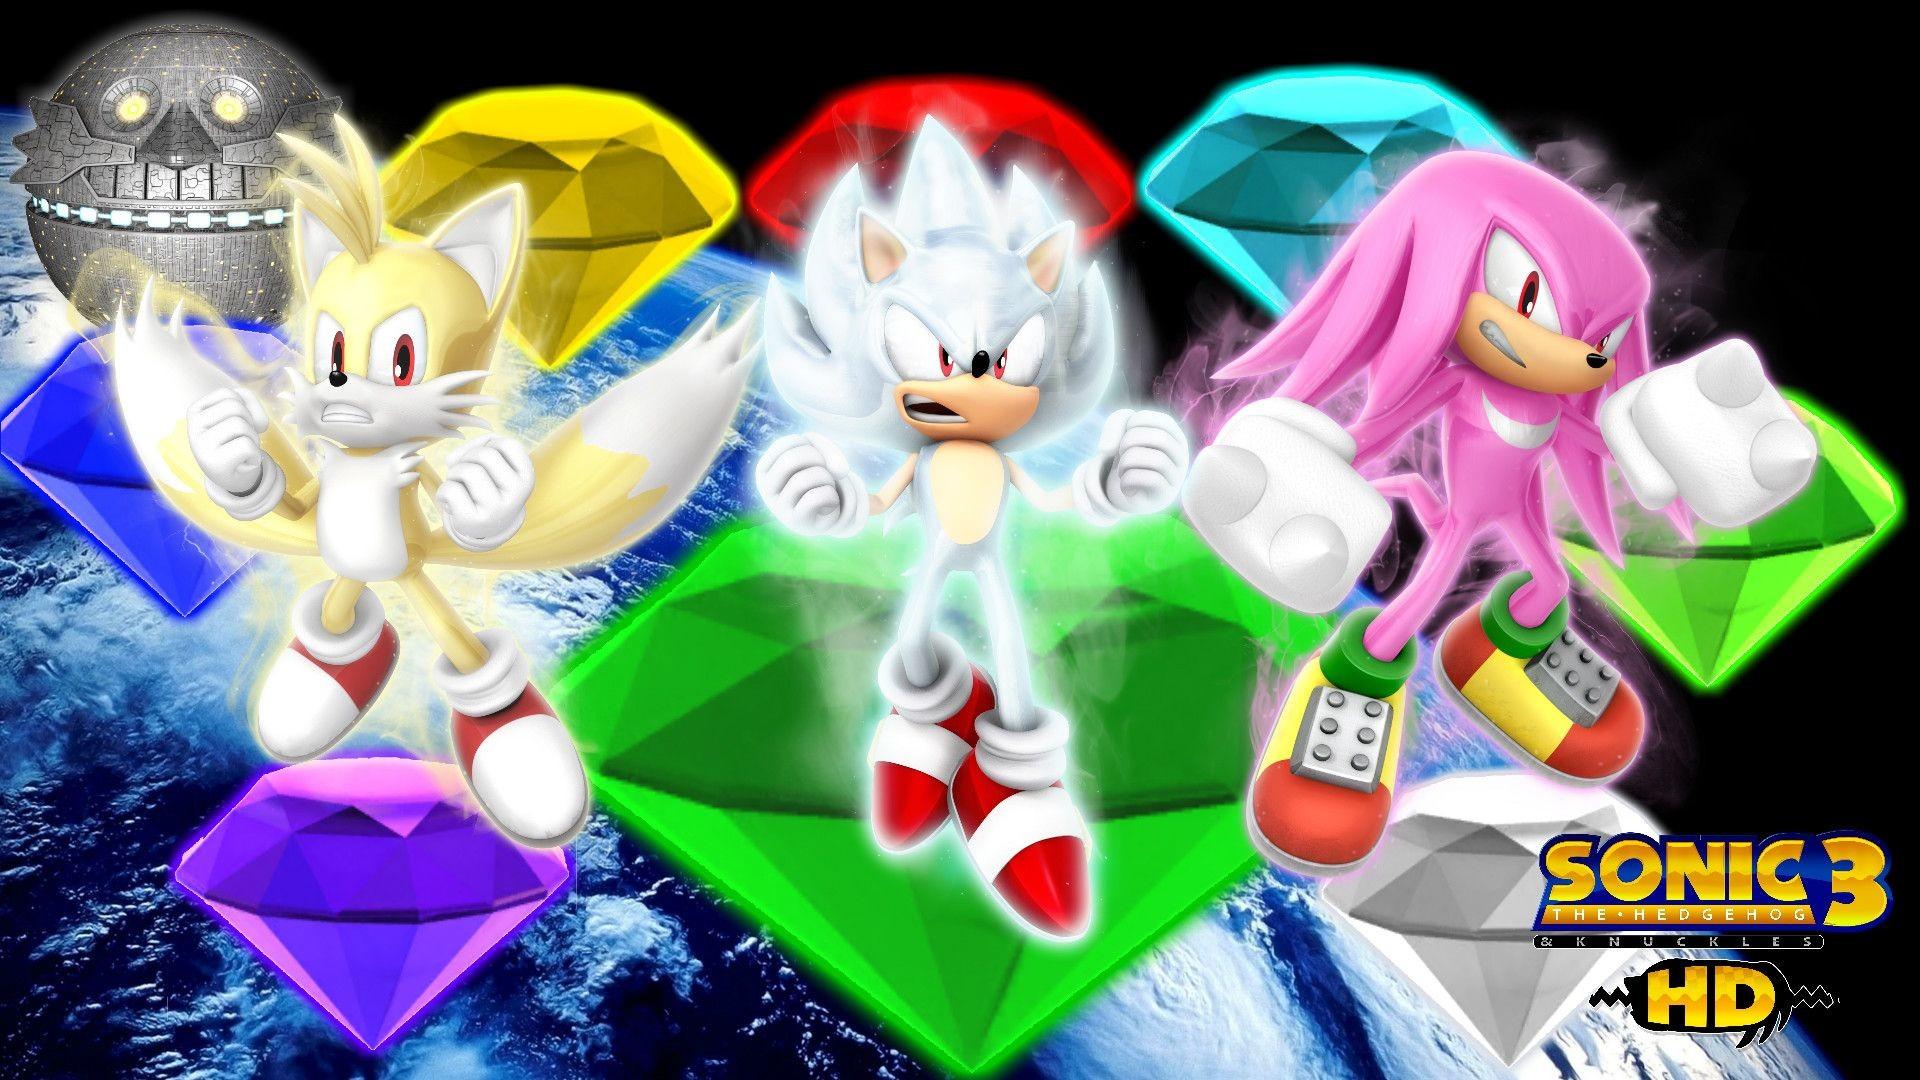 Hyper Sonic The Hedgehog Wallpaper Wallpapertag